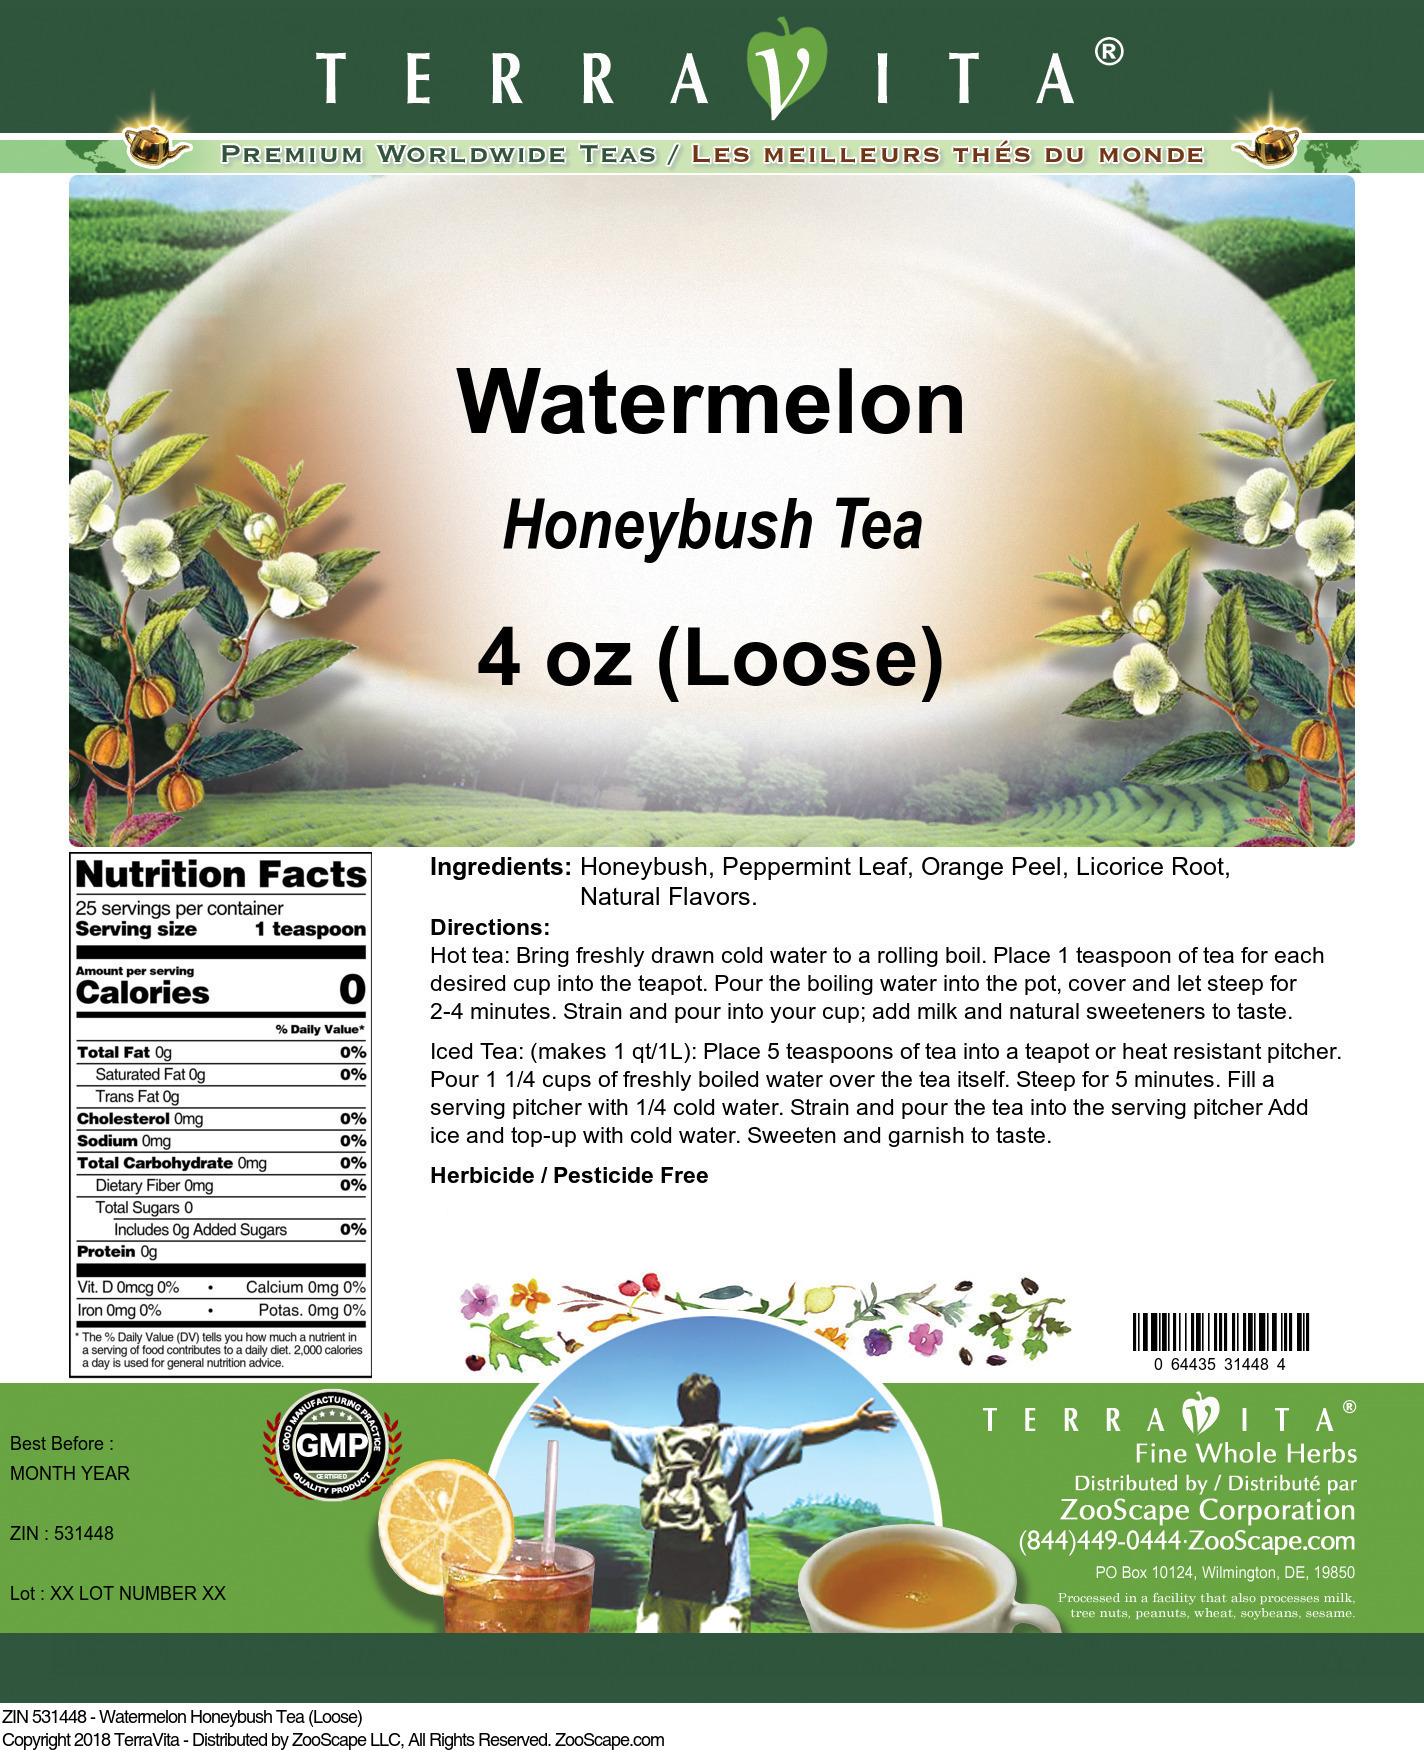 Watermelon Honeybush Tea